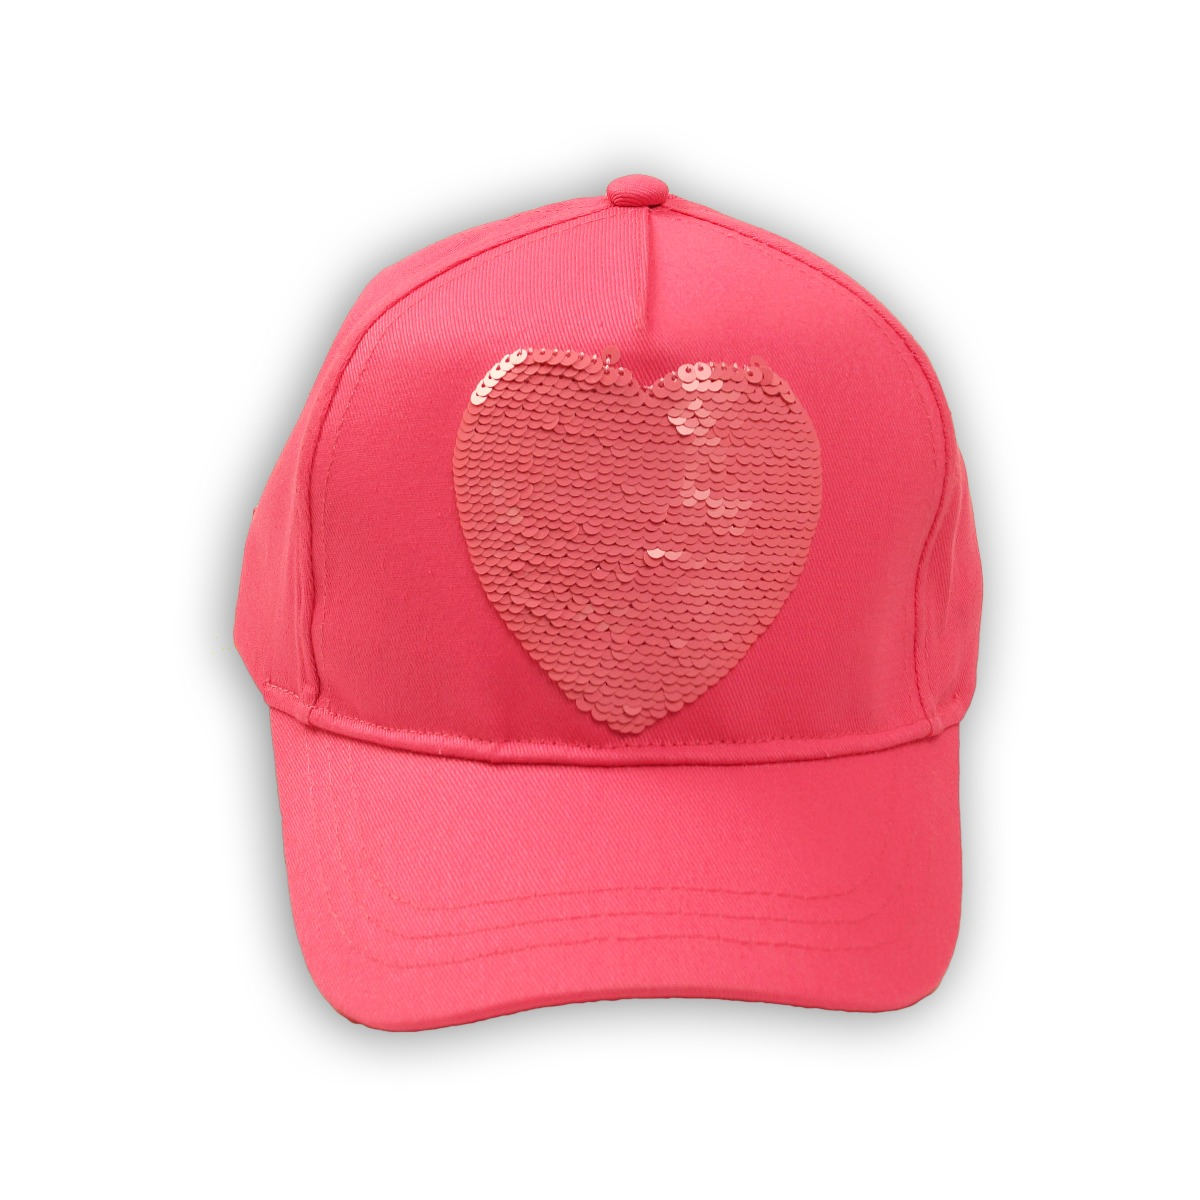 Sapca cu imprimeu Minoti Access Heart imagine